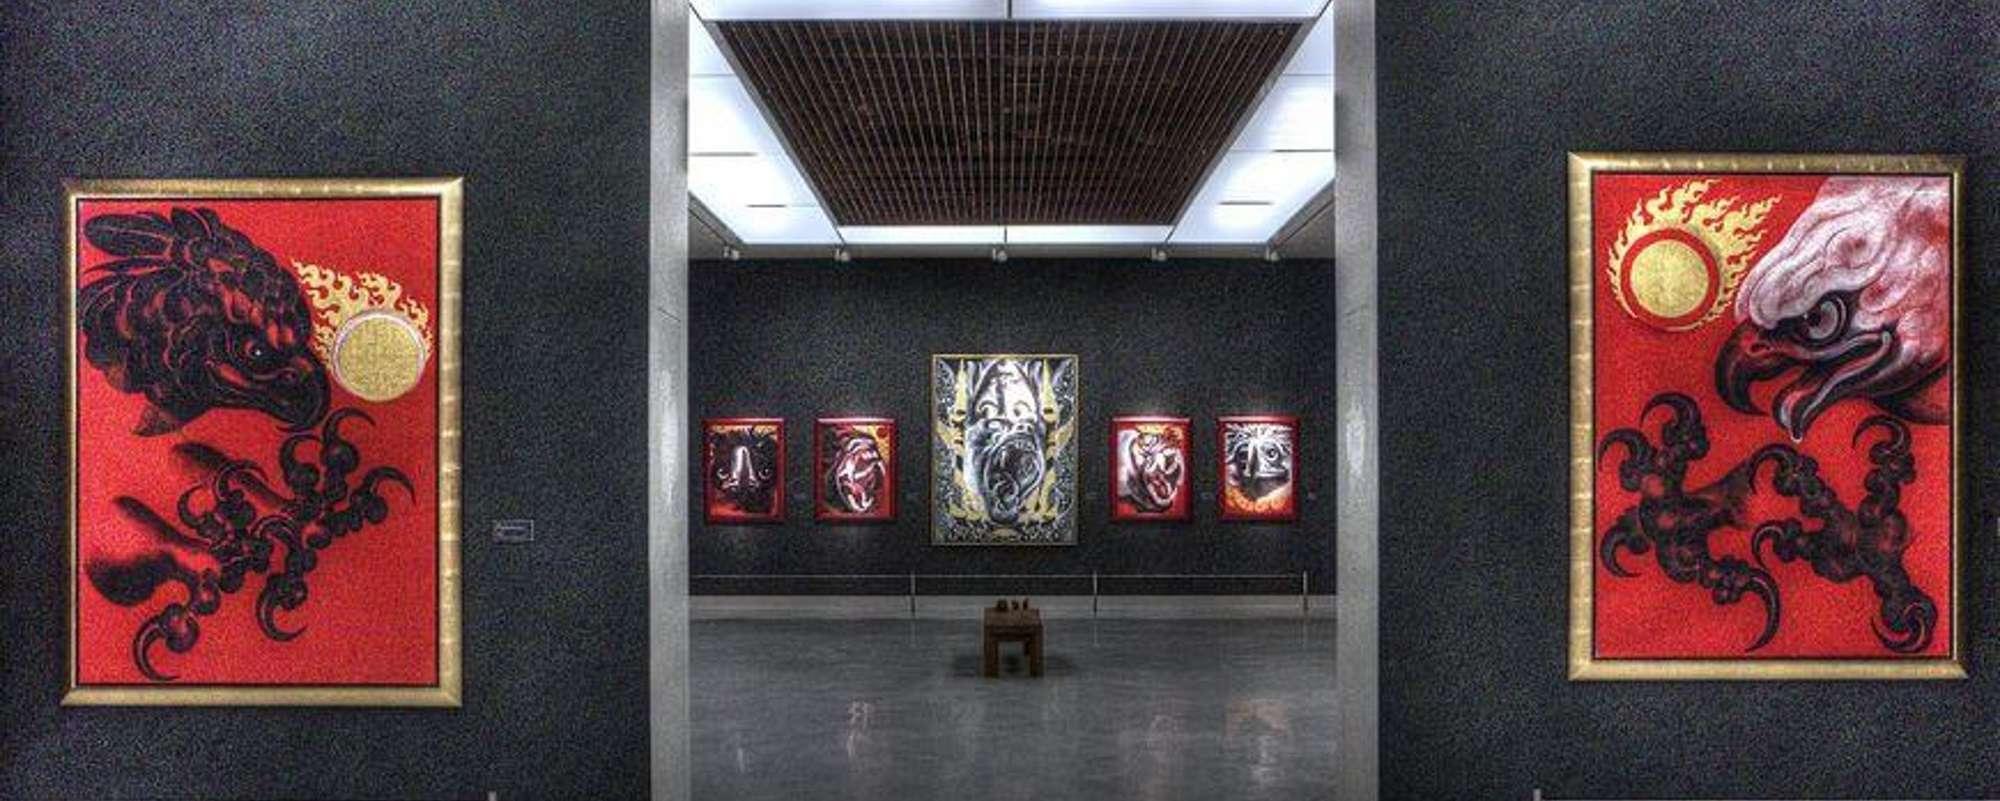 Bangkok Art and Culture, Art Galleries & Museums